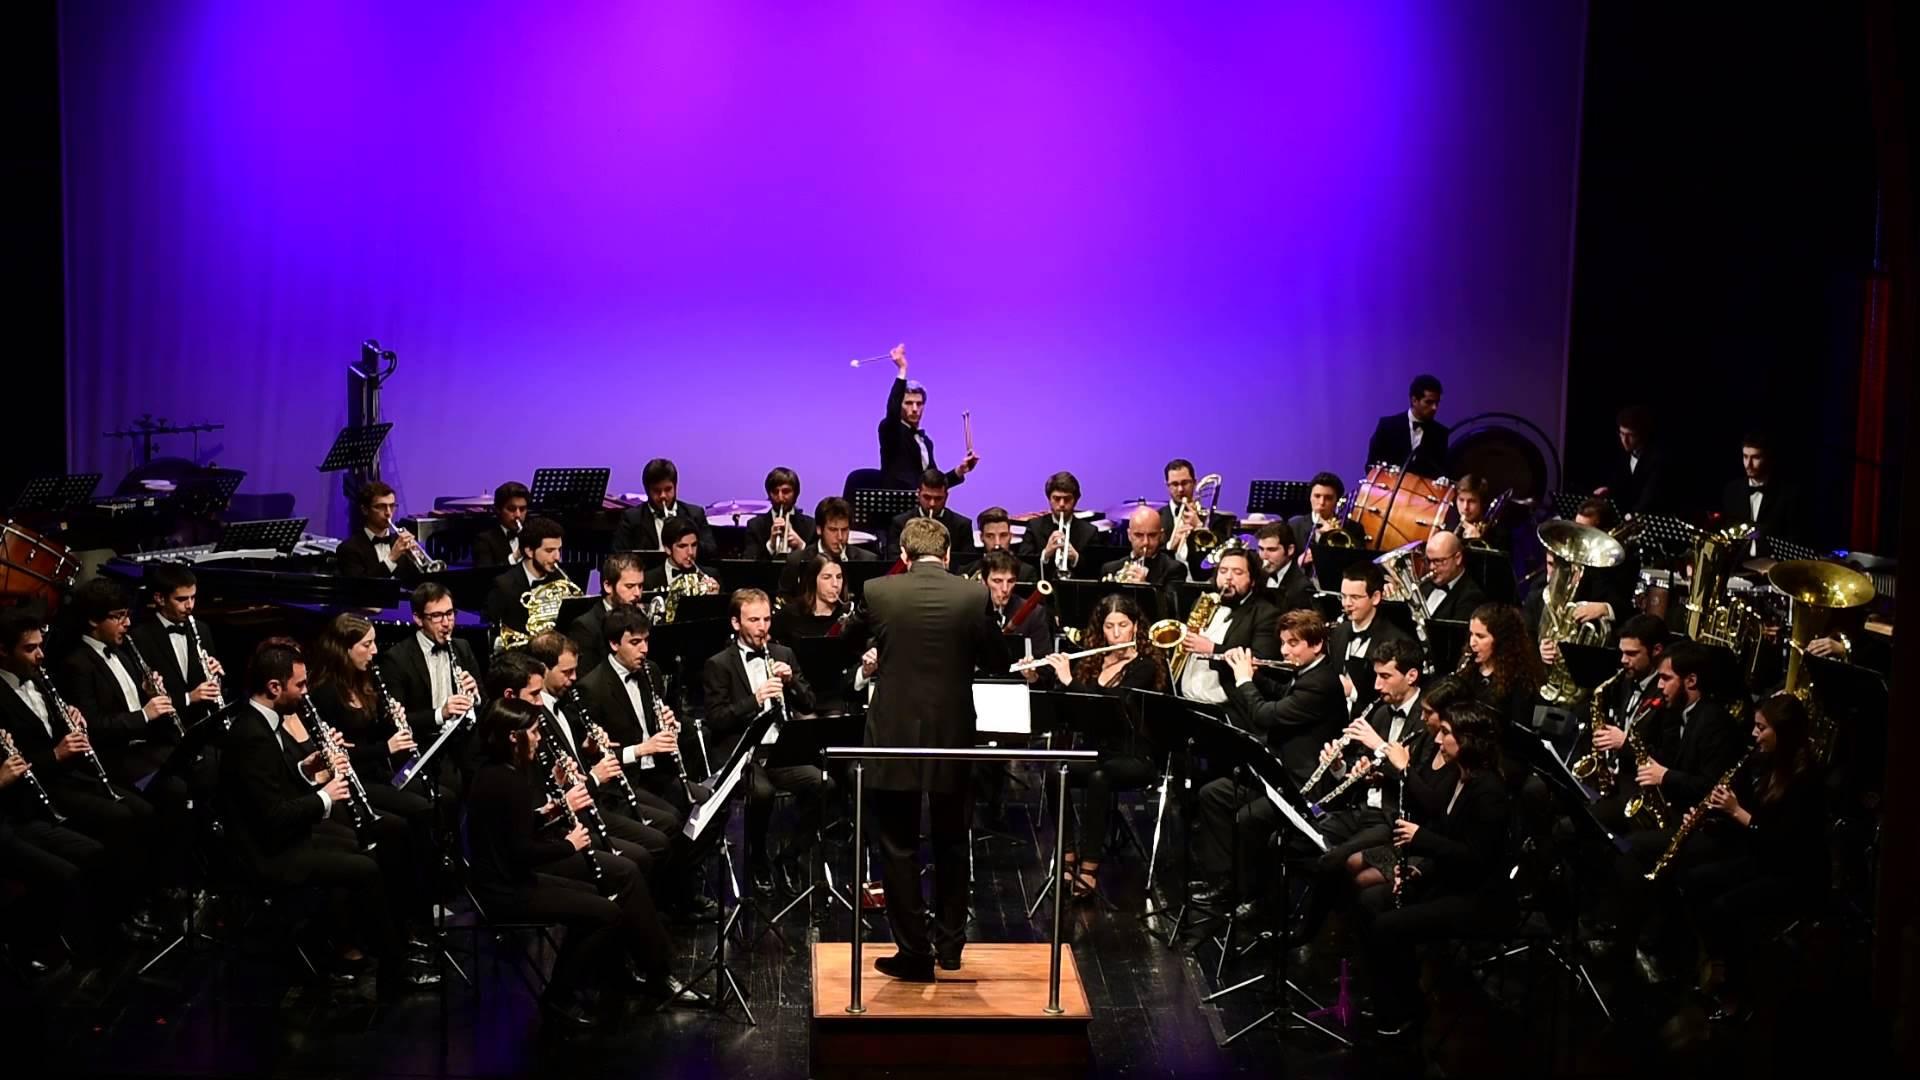 Banda Sinfónica Portuguesa ~625.jpg